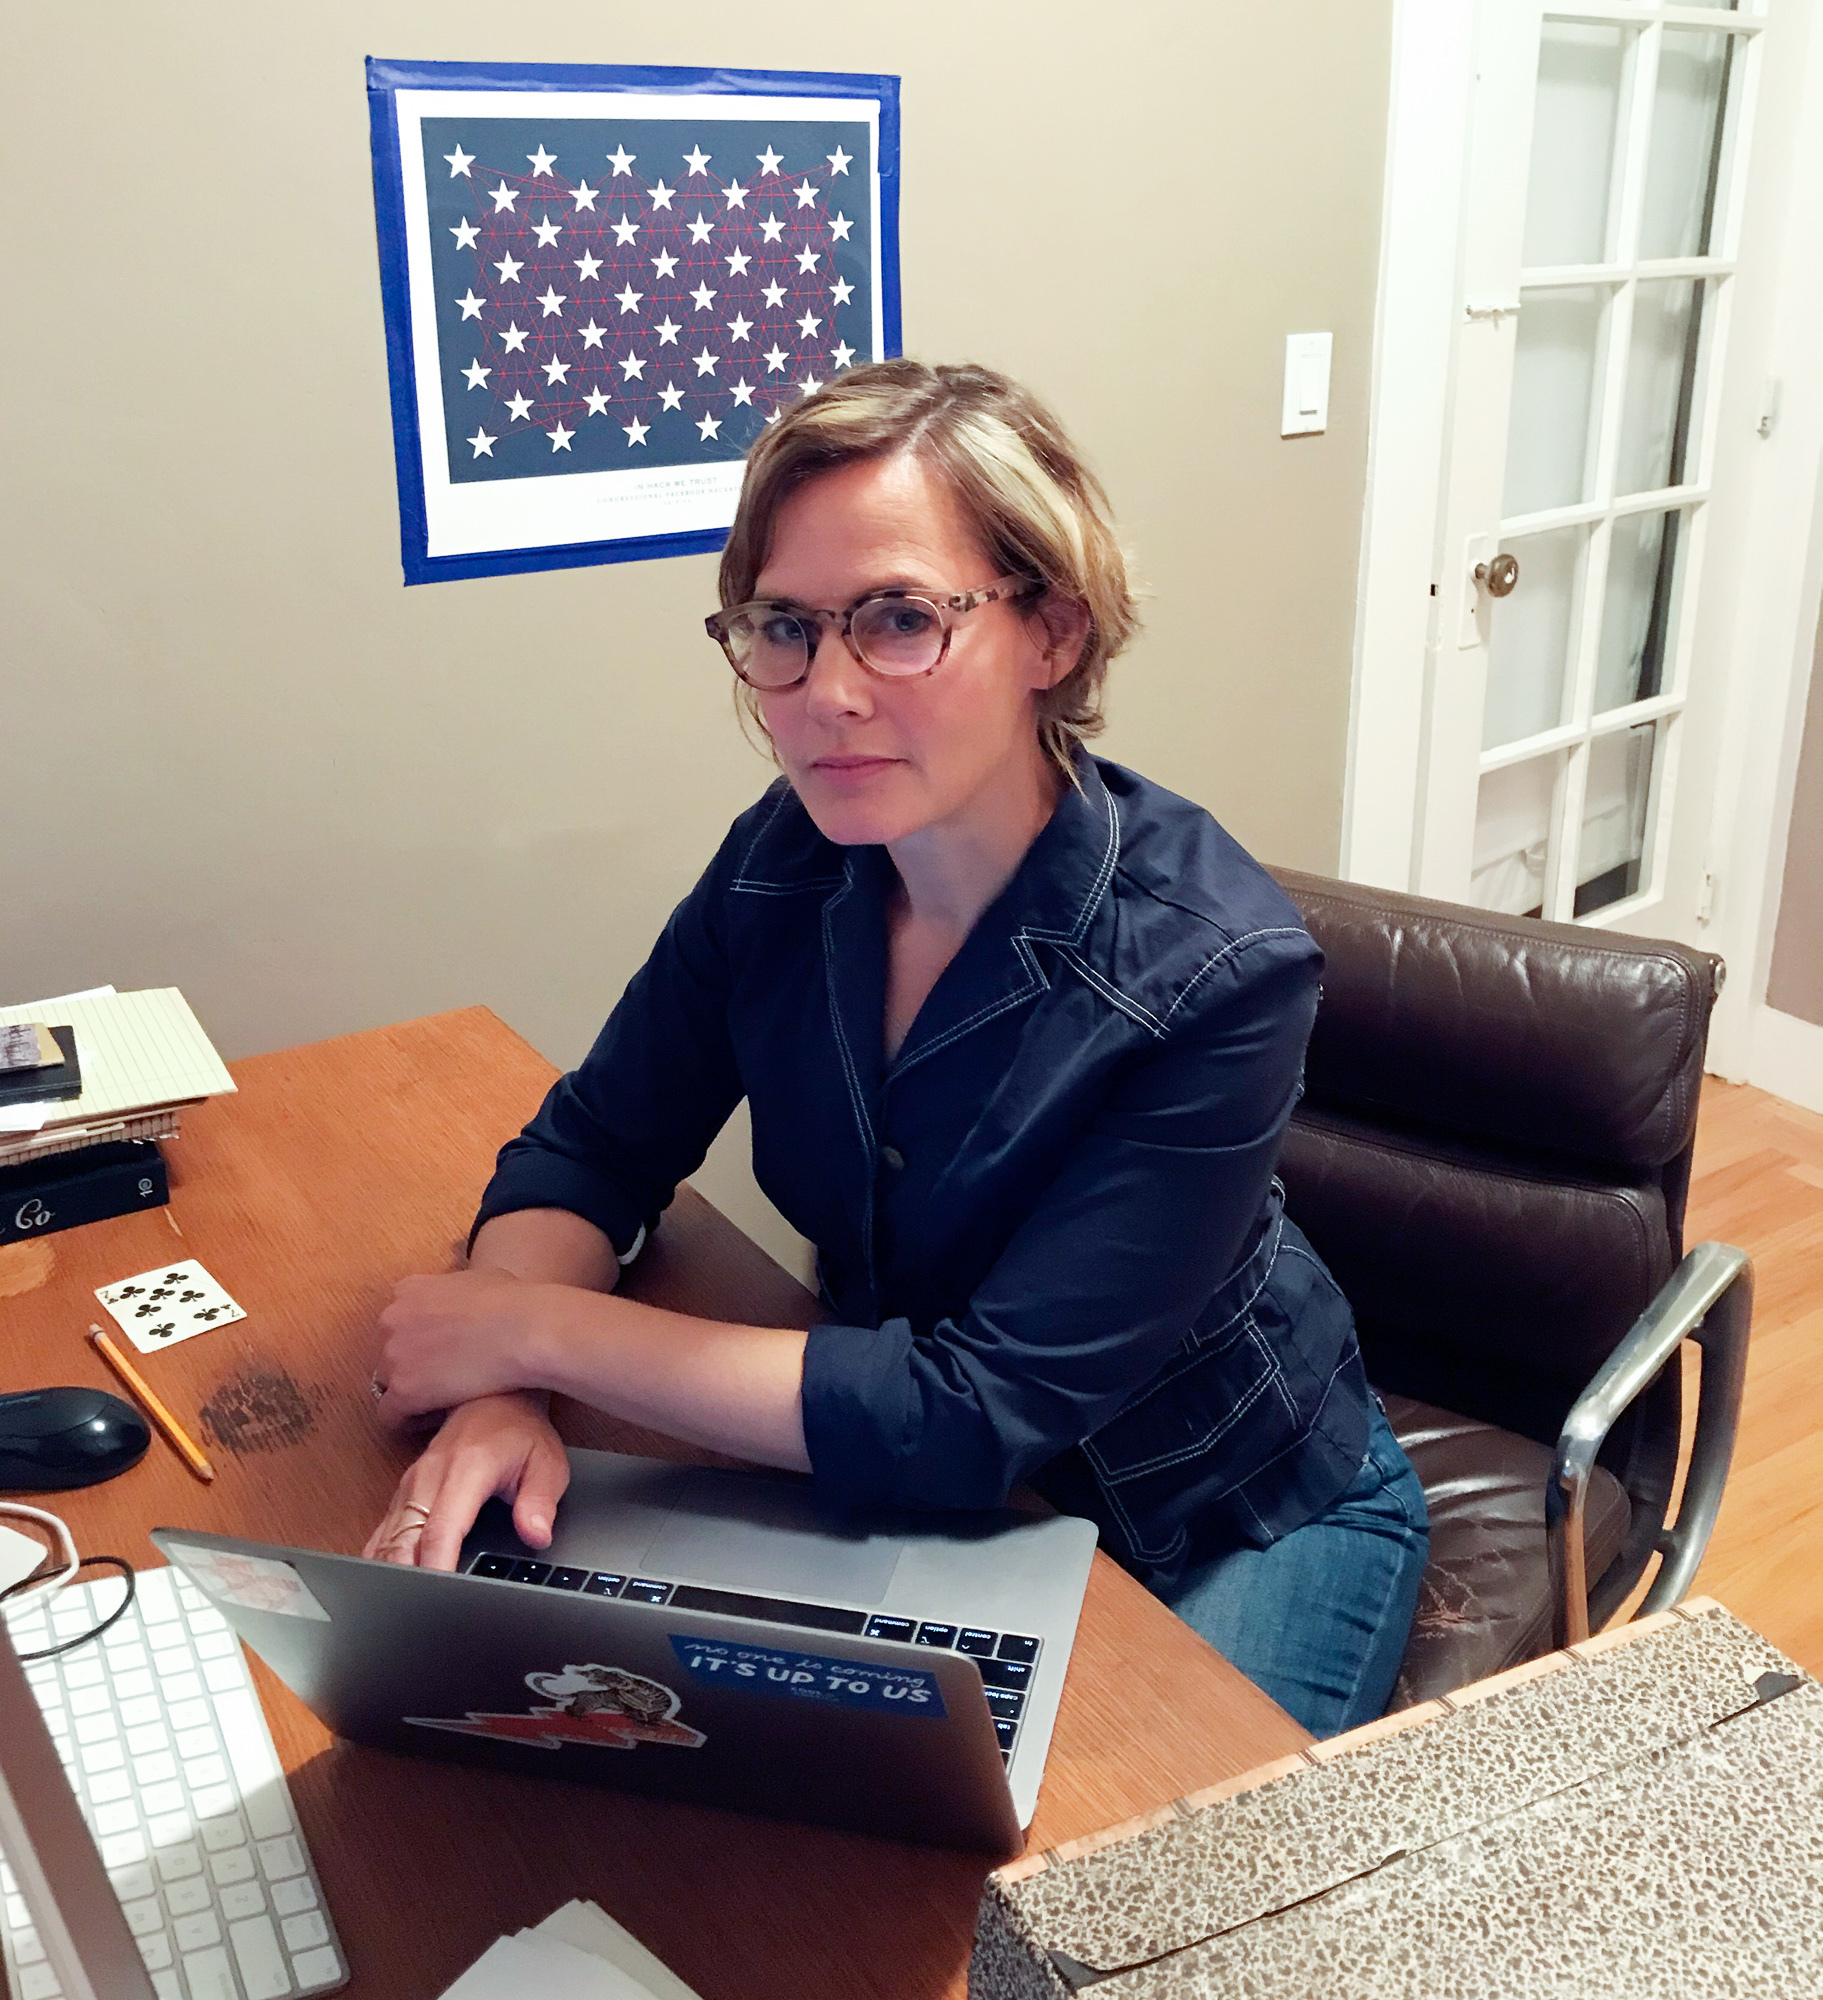 Jennifer Pahlka sits at a desk